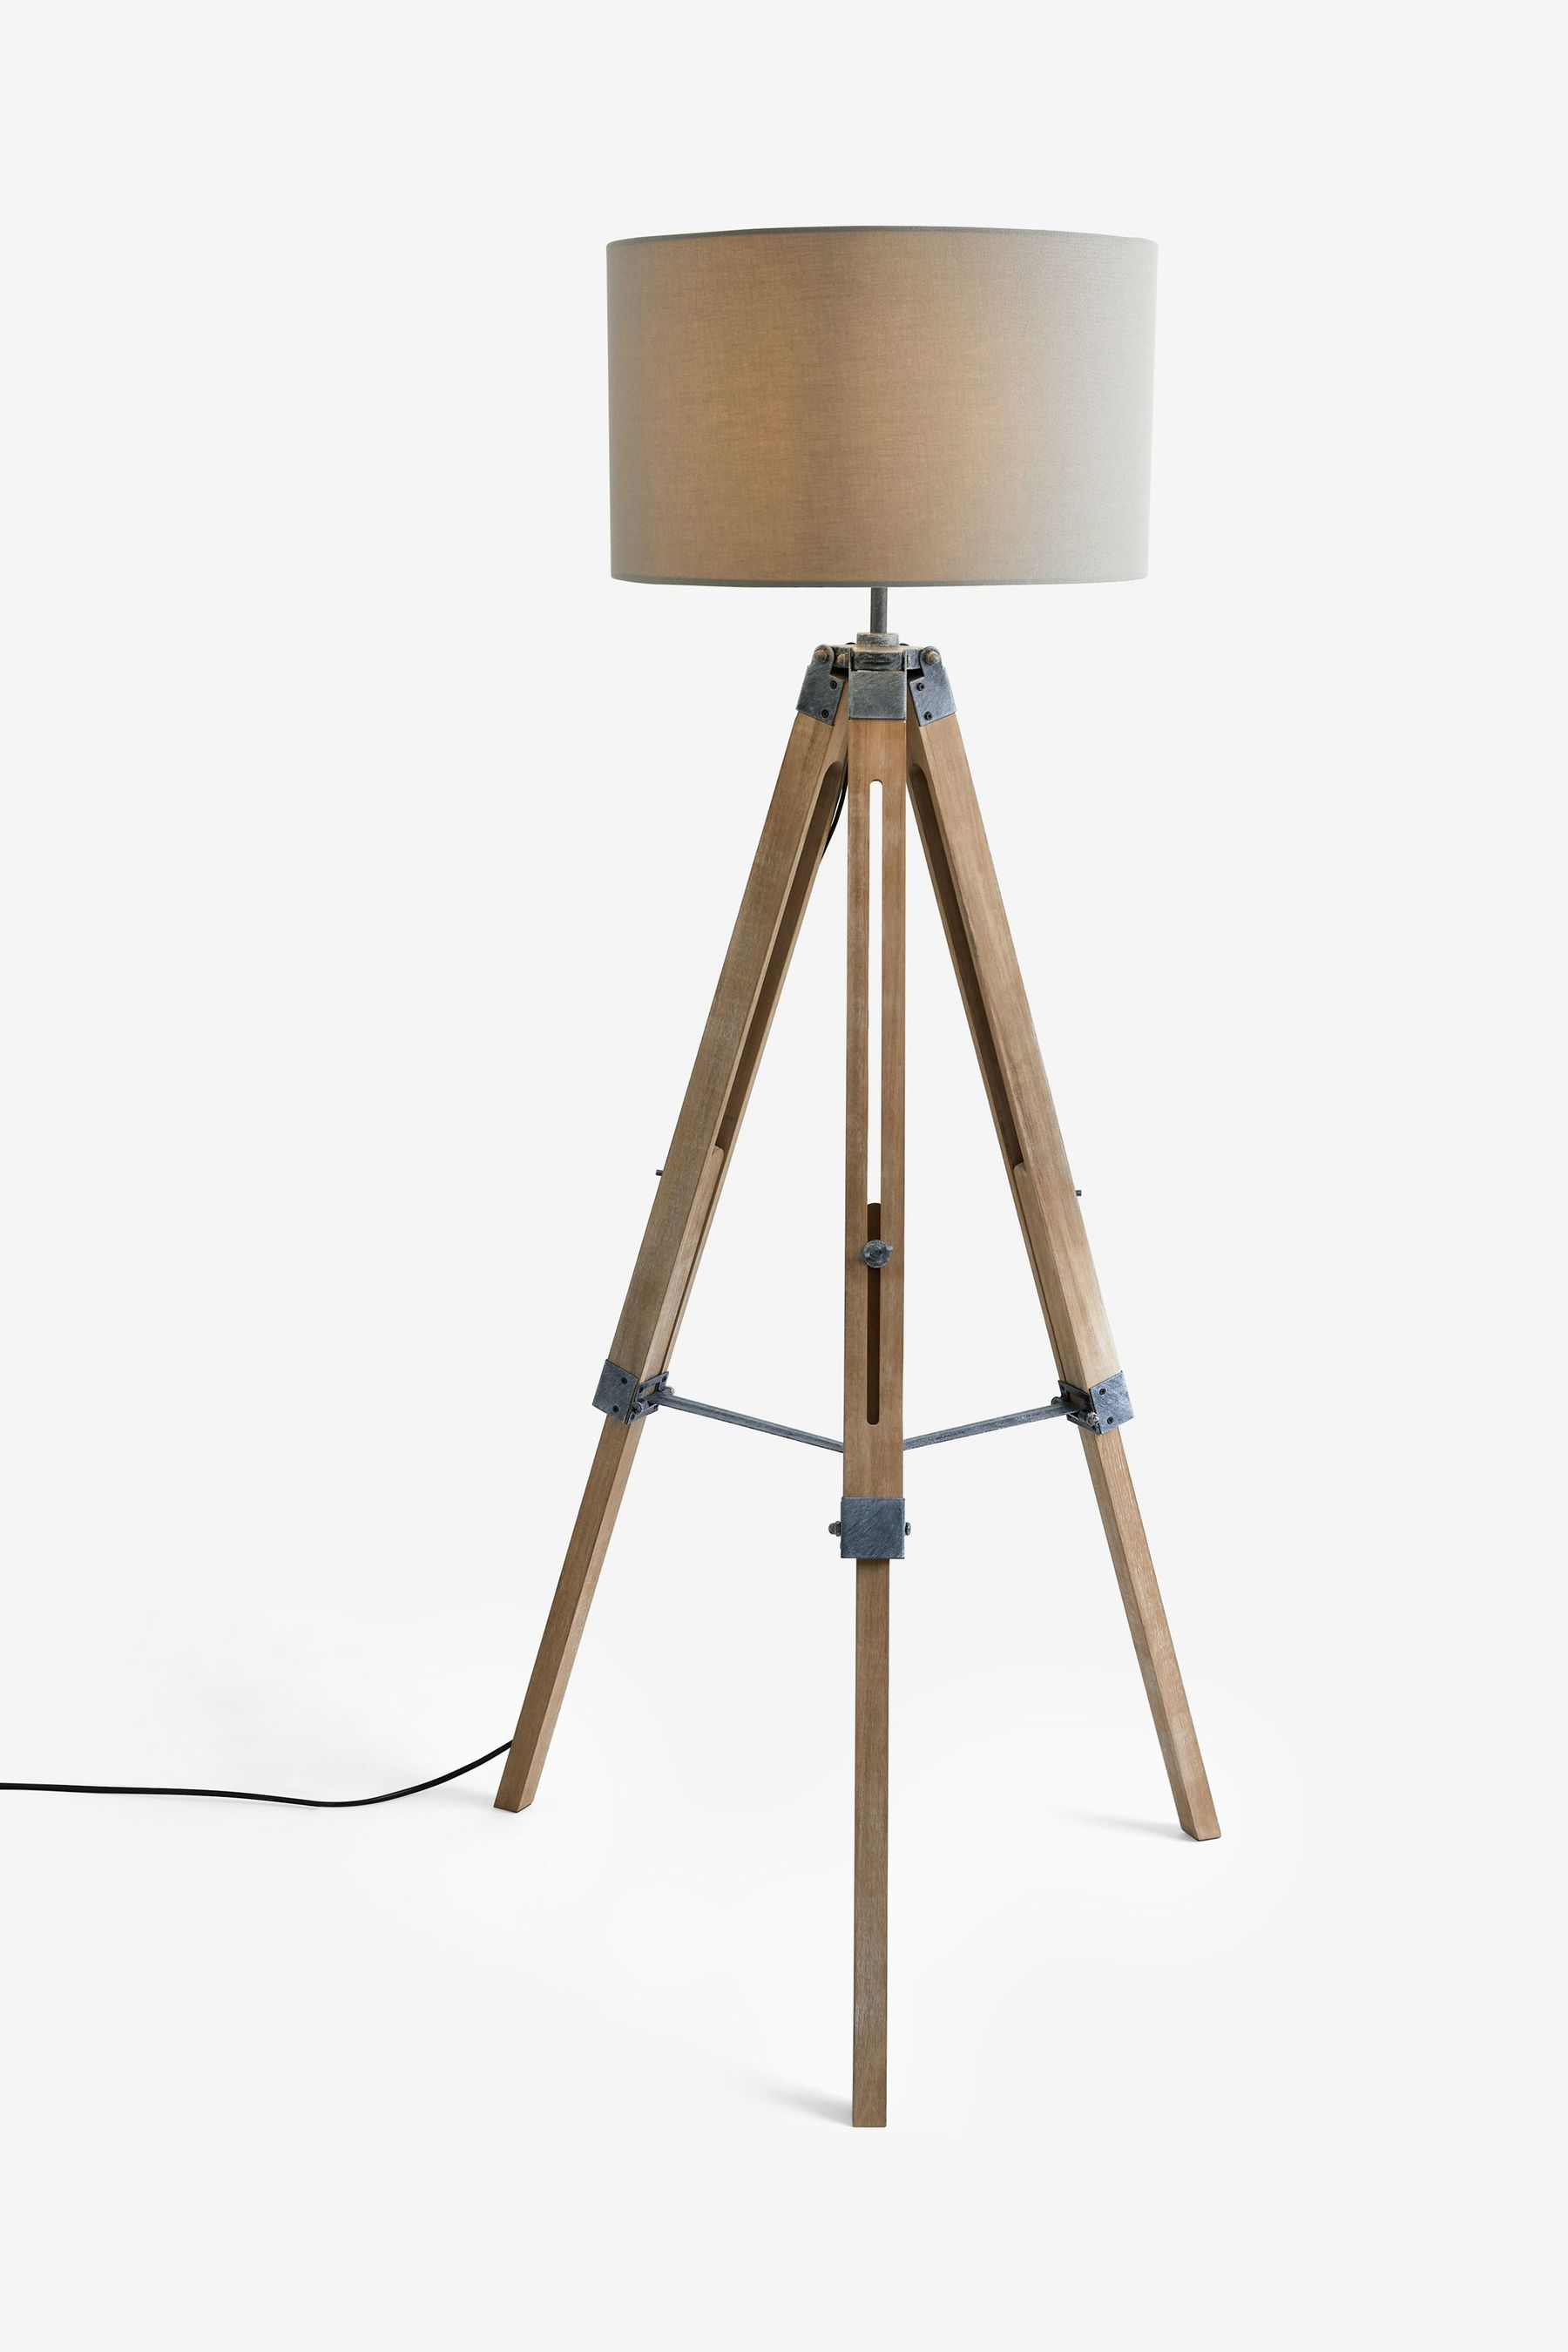 Next alpine tripod floor lamp grey bluewater gbp14000 for Copper floor lamp john lewis